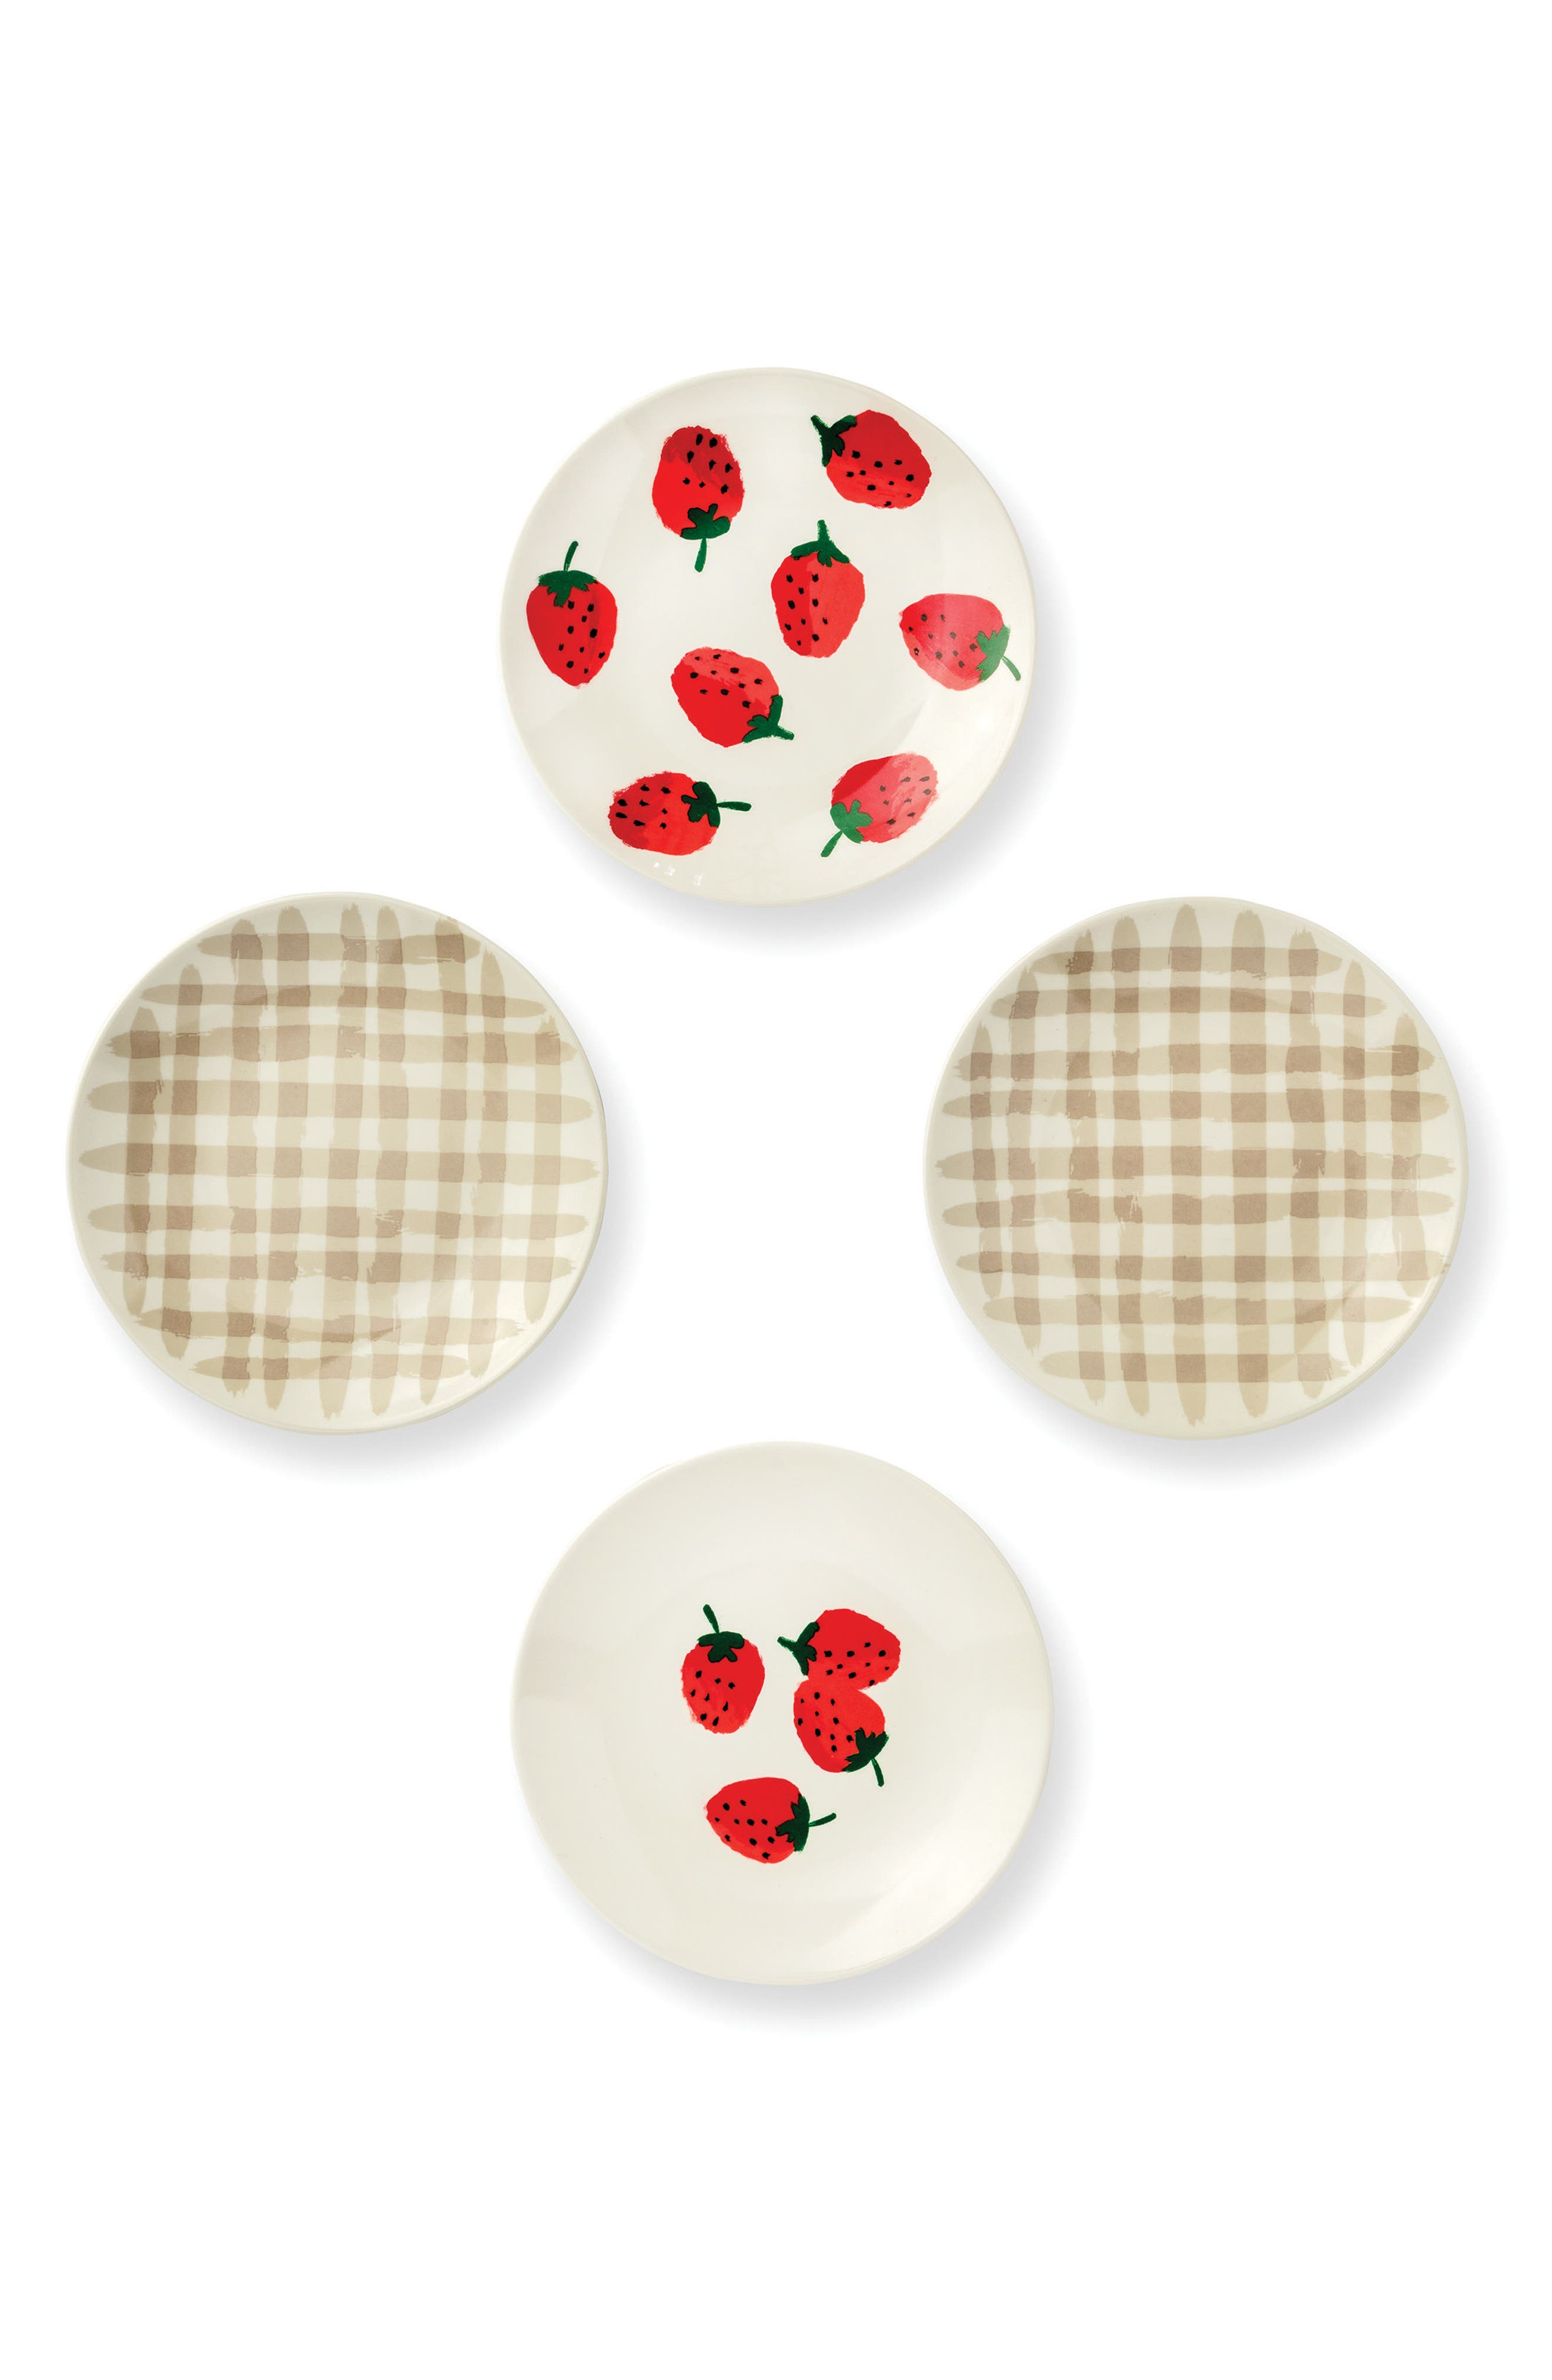 kate spade new york strawberries set of 4 melamine tidbit plates